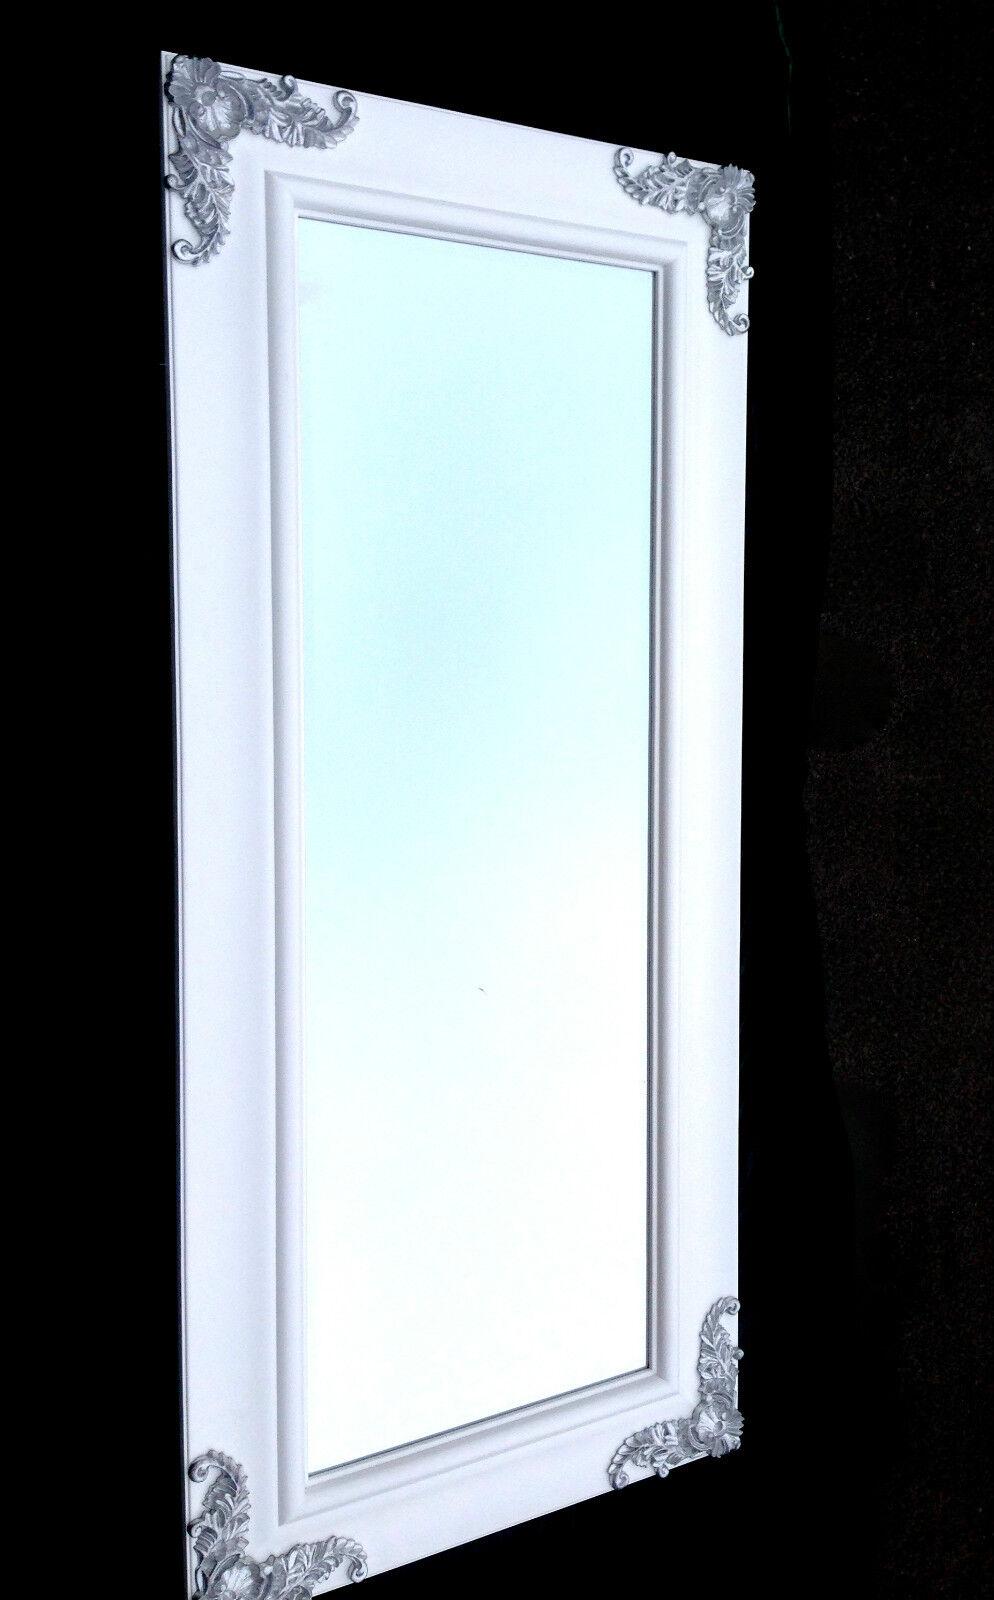 xxl wandspiegel wei silber 180x80 wei friseurspiegel flur spiegel gro ebay. Black Bedroom Furniture Sets. Home Design Ideas